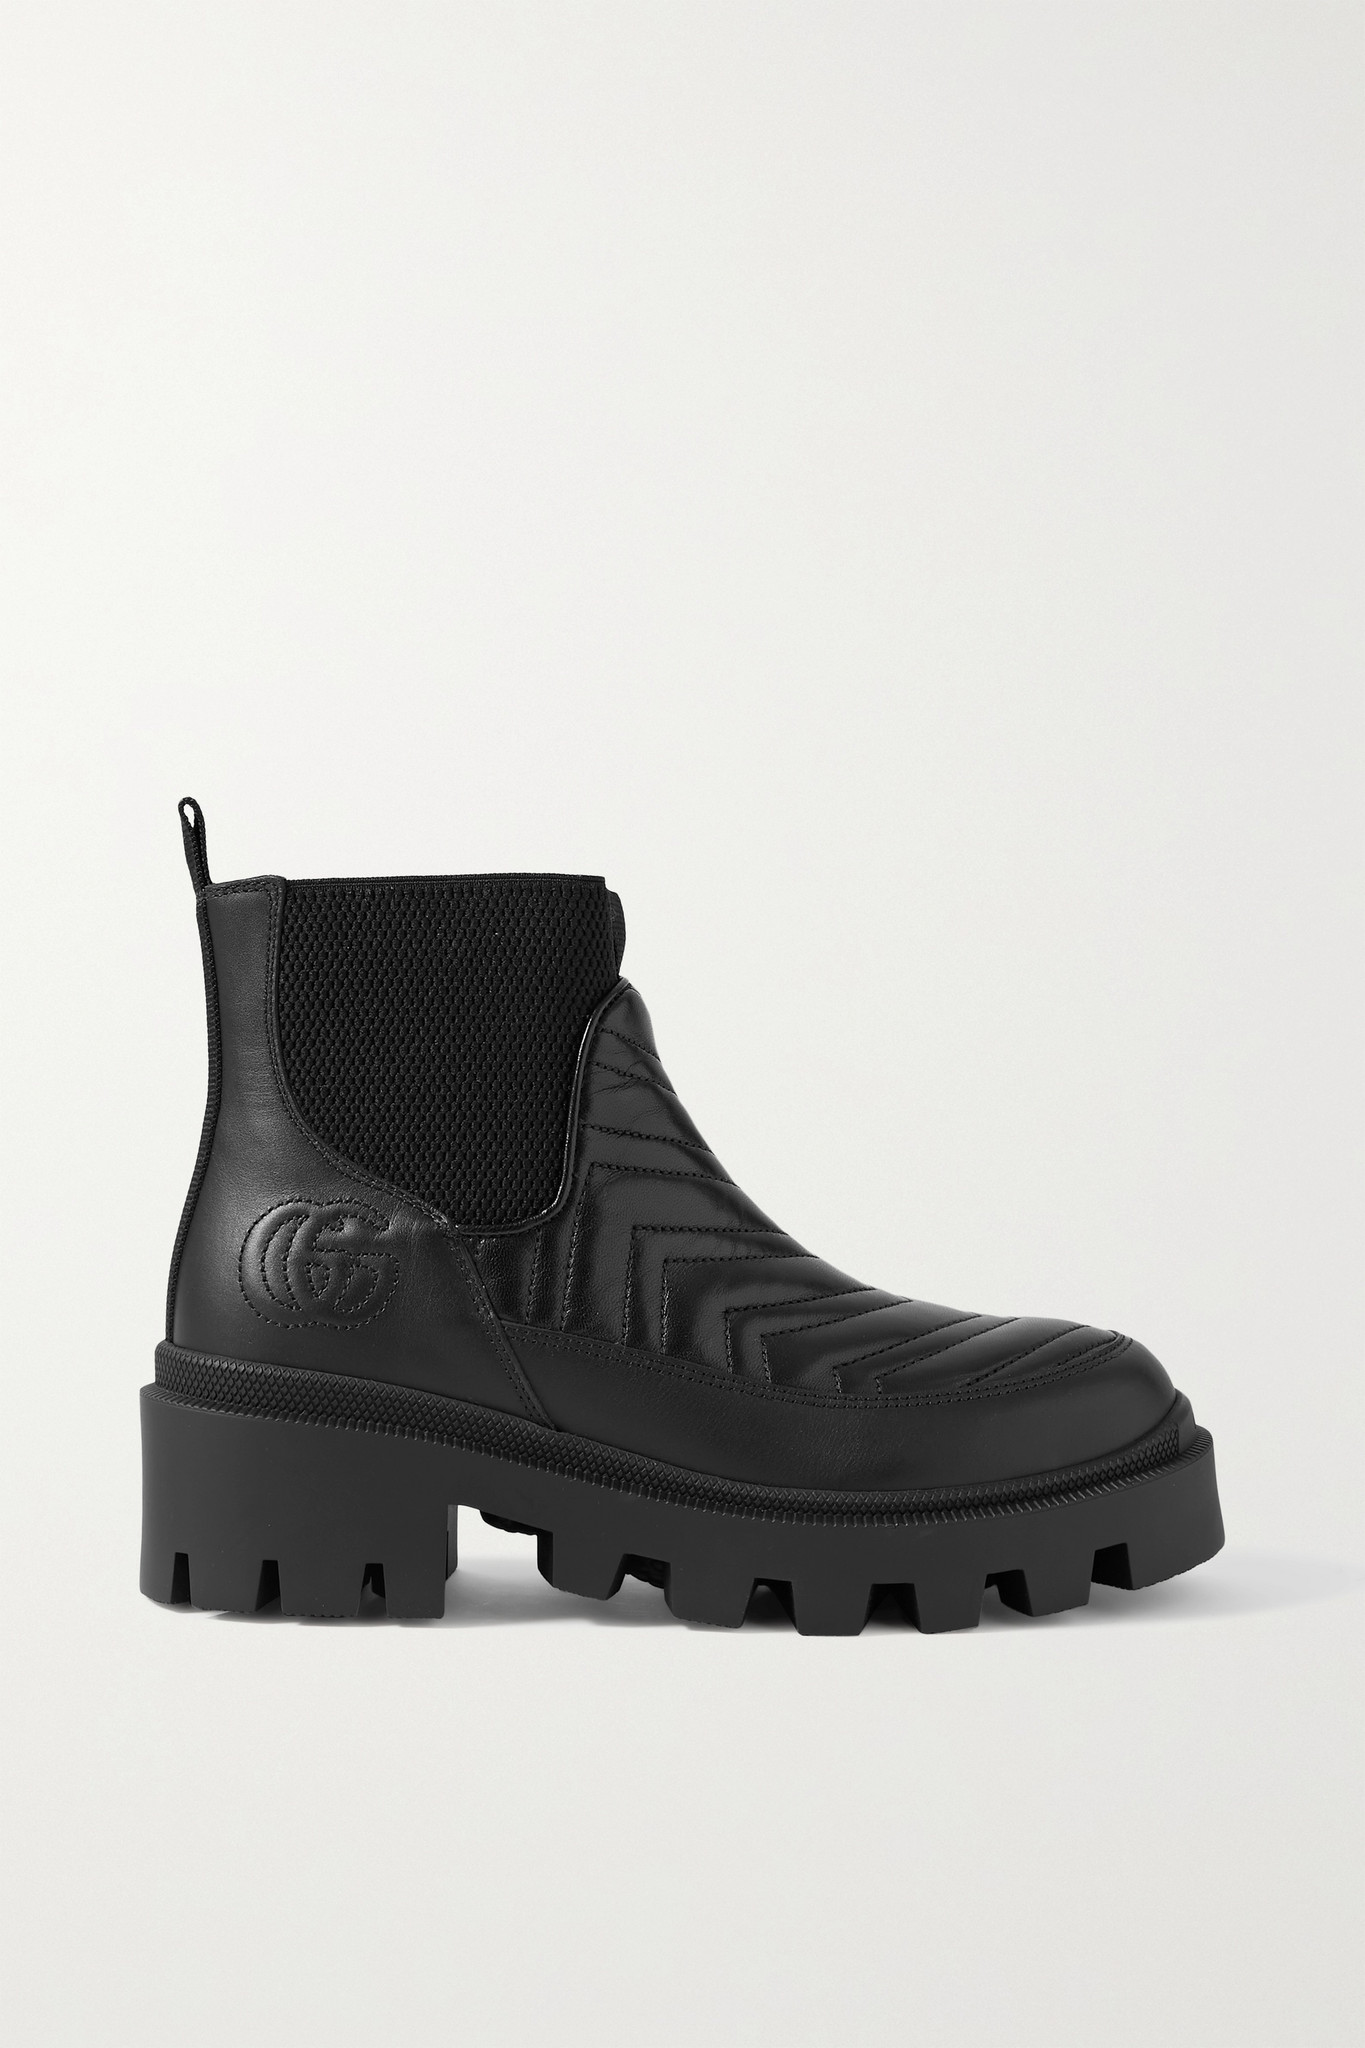 GUCCI - Frances Logo-embroidered Matelassé Leather Chelsea Boots - Black - IT35.5